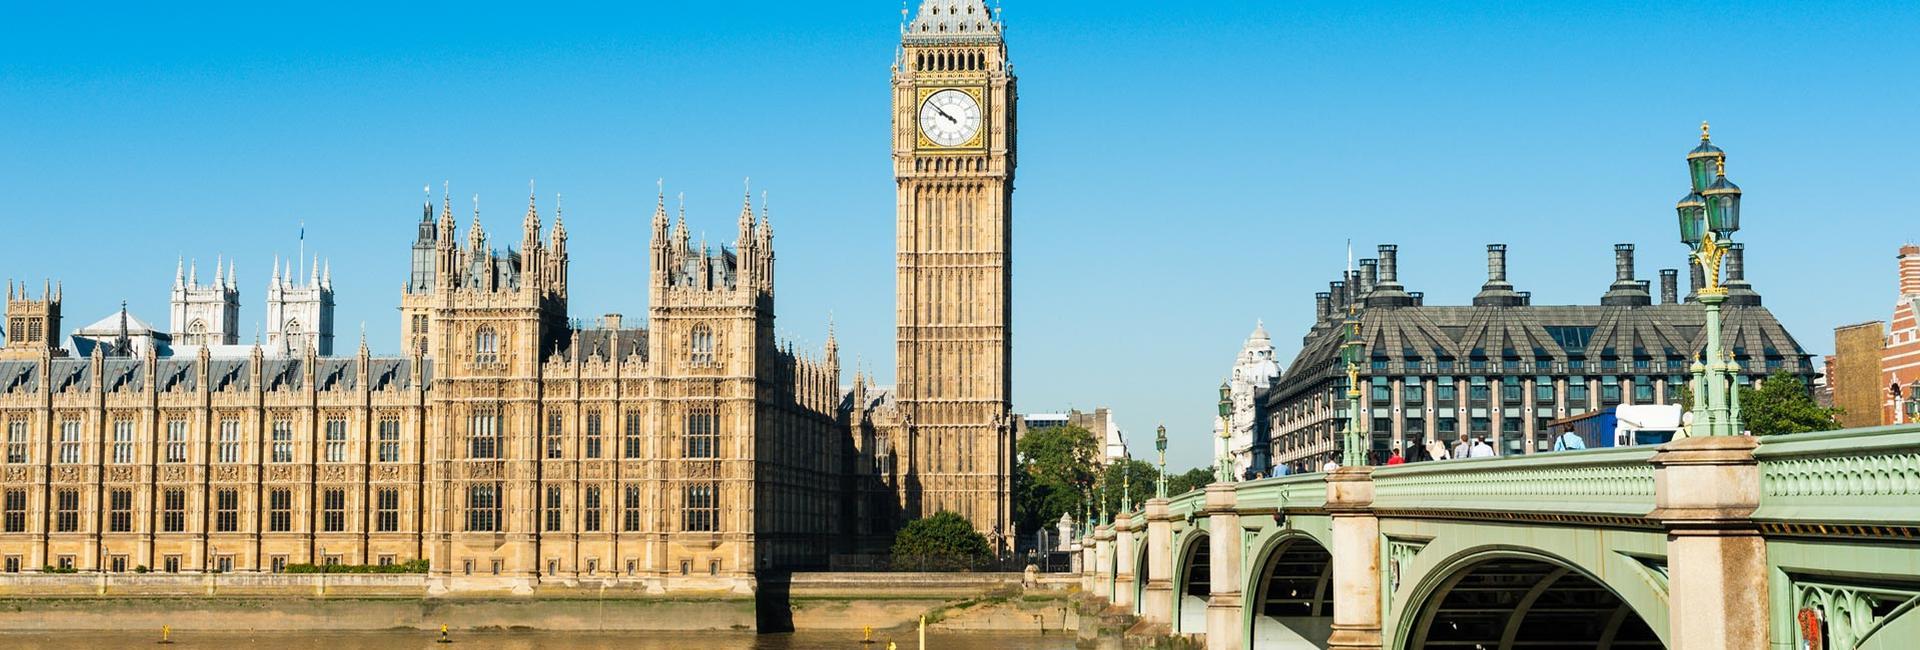 London Westminster - London Property Market